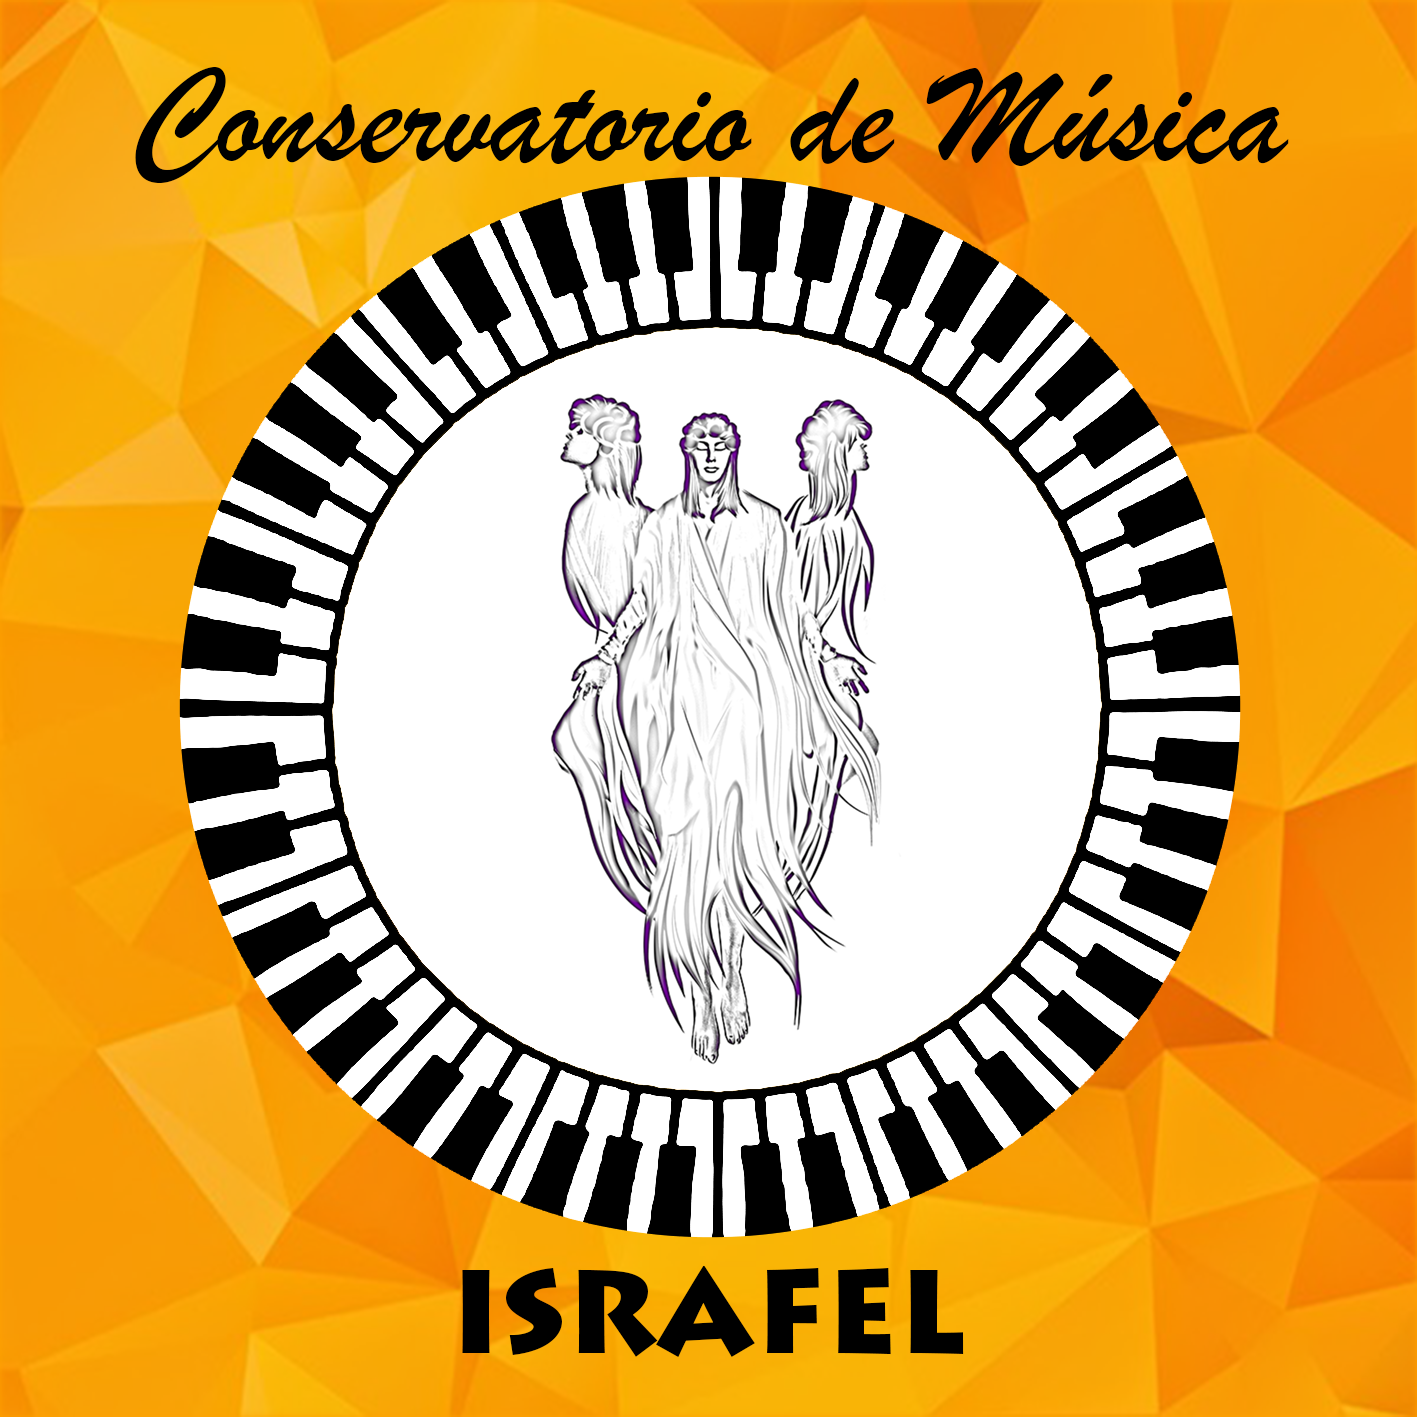 Dex loggica conservatorio de m sica israfel for Conservatorio de musica